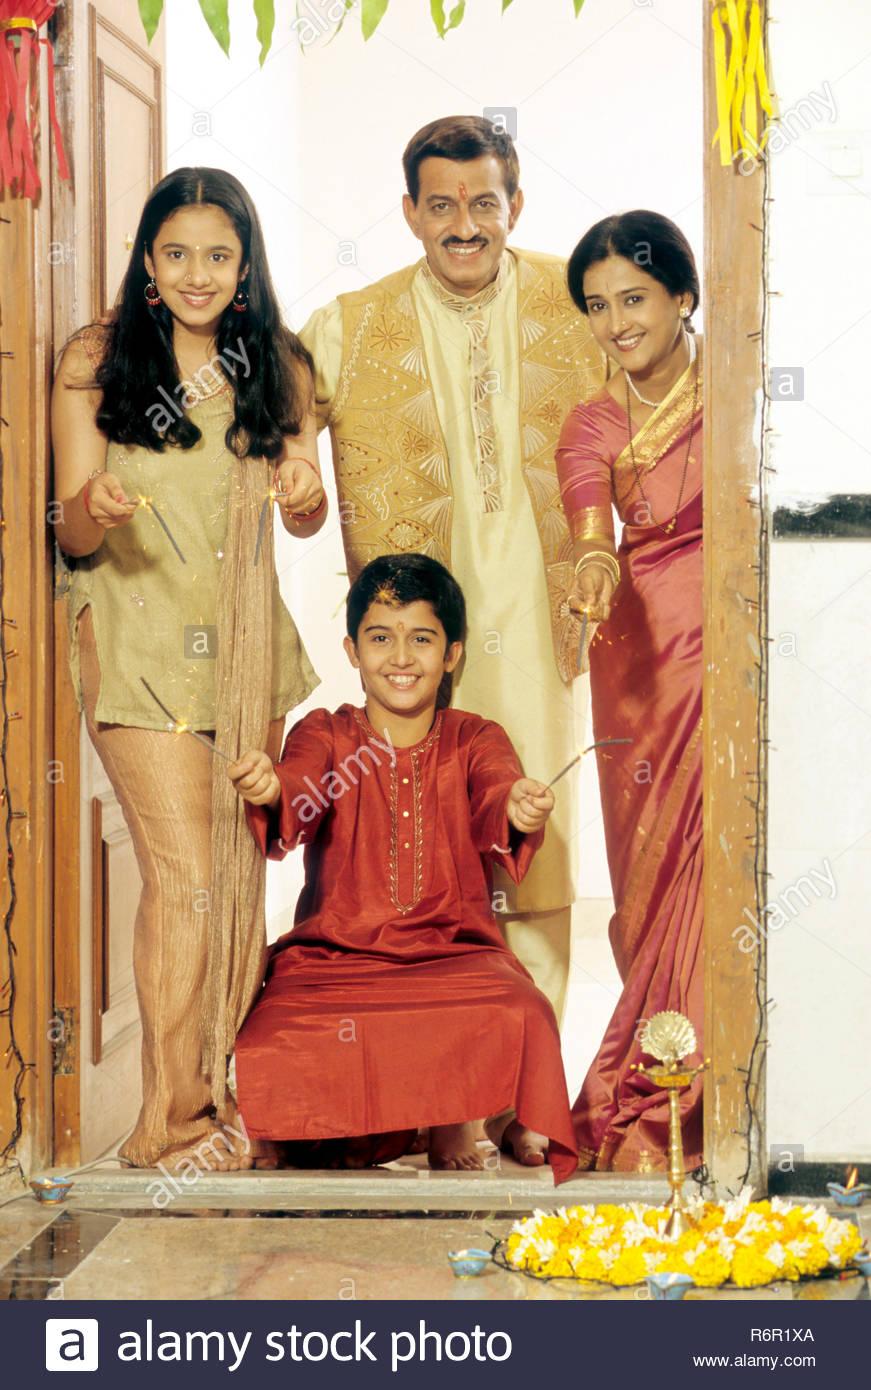 MAK-42403 : Family Celebrating Diwali deepawali Festival MR.NO.275.276.277.278 - Stock Image